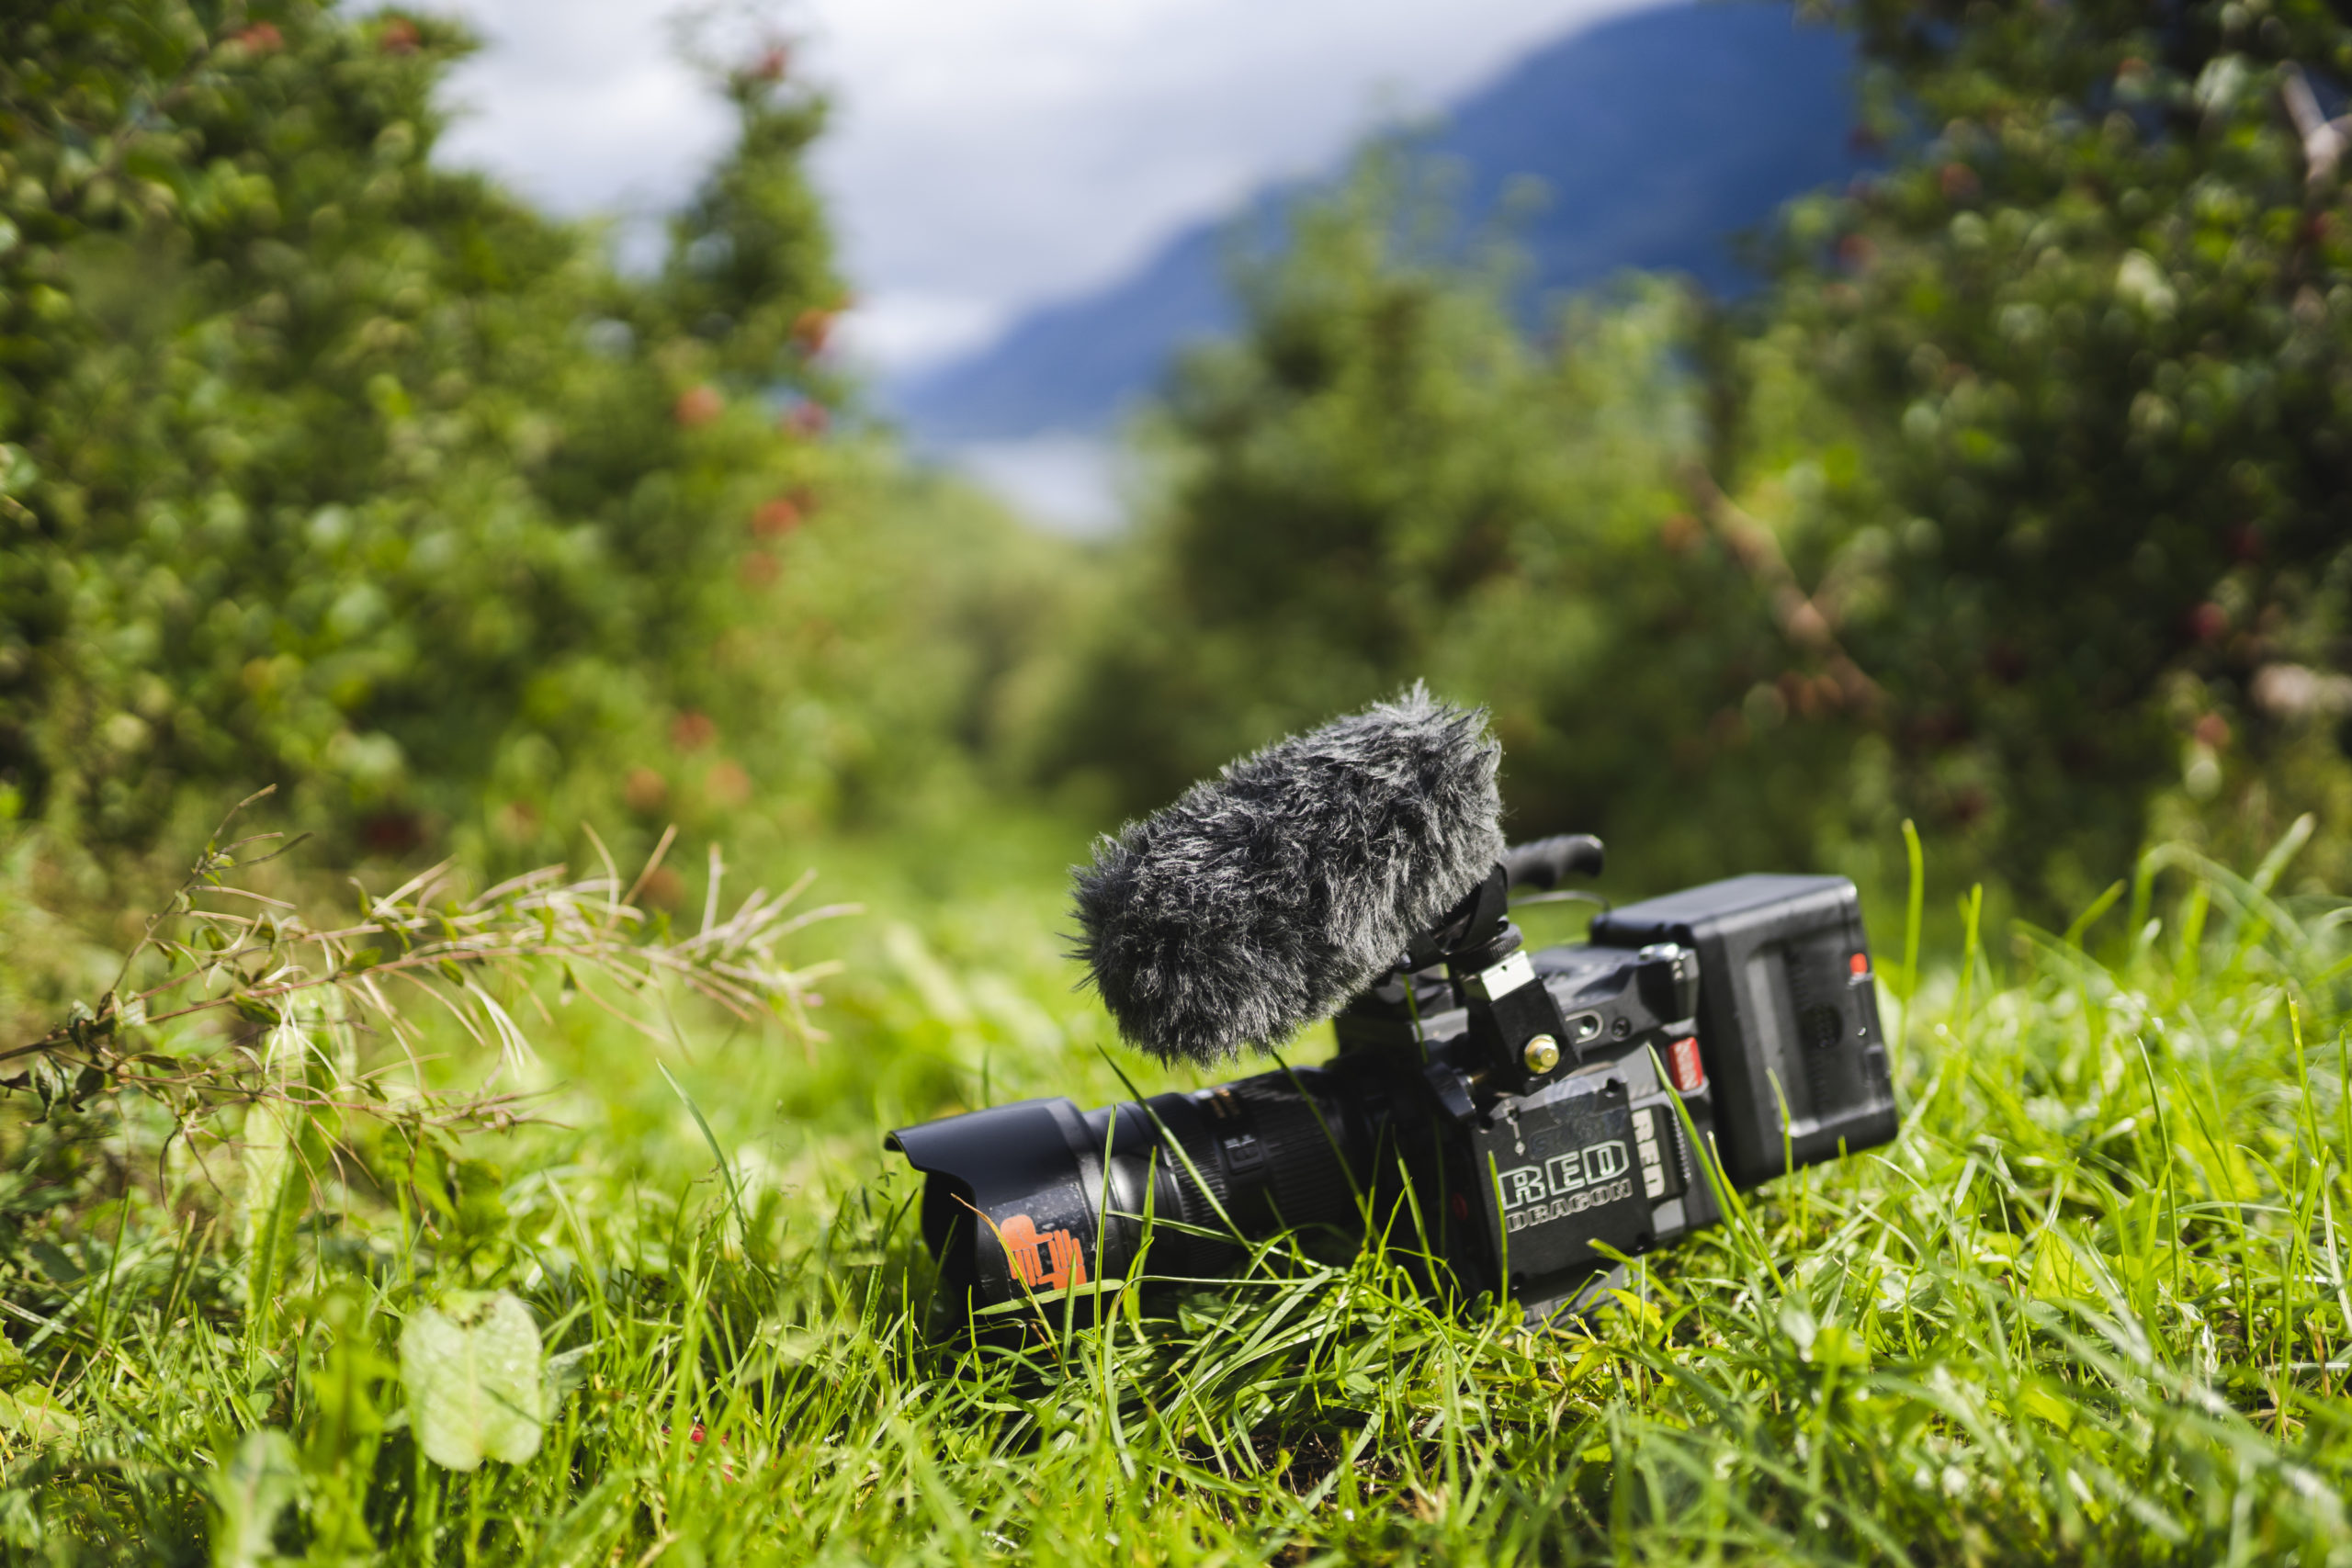 Filmkamera liggande i gras mellom epletre. Foto.